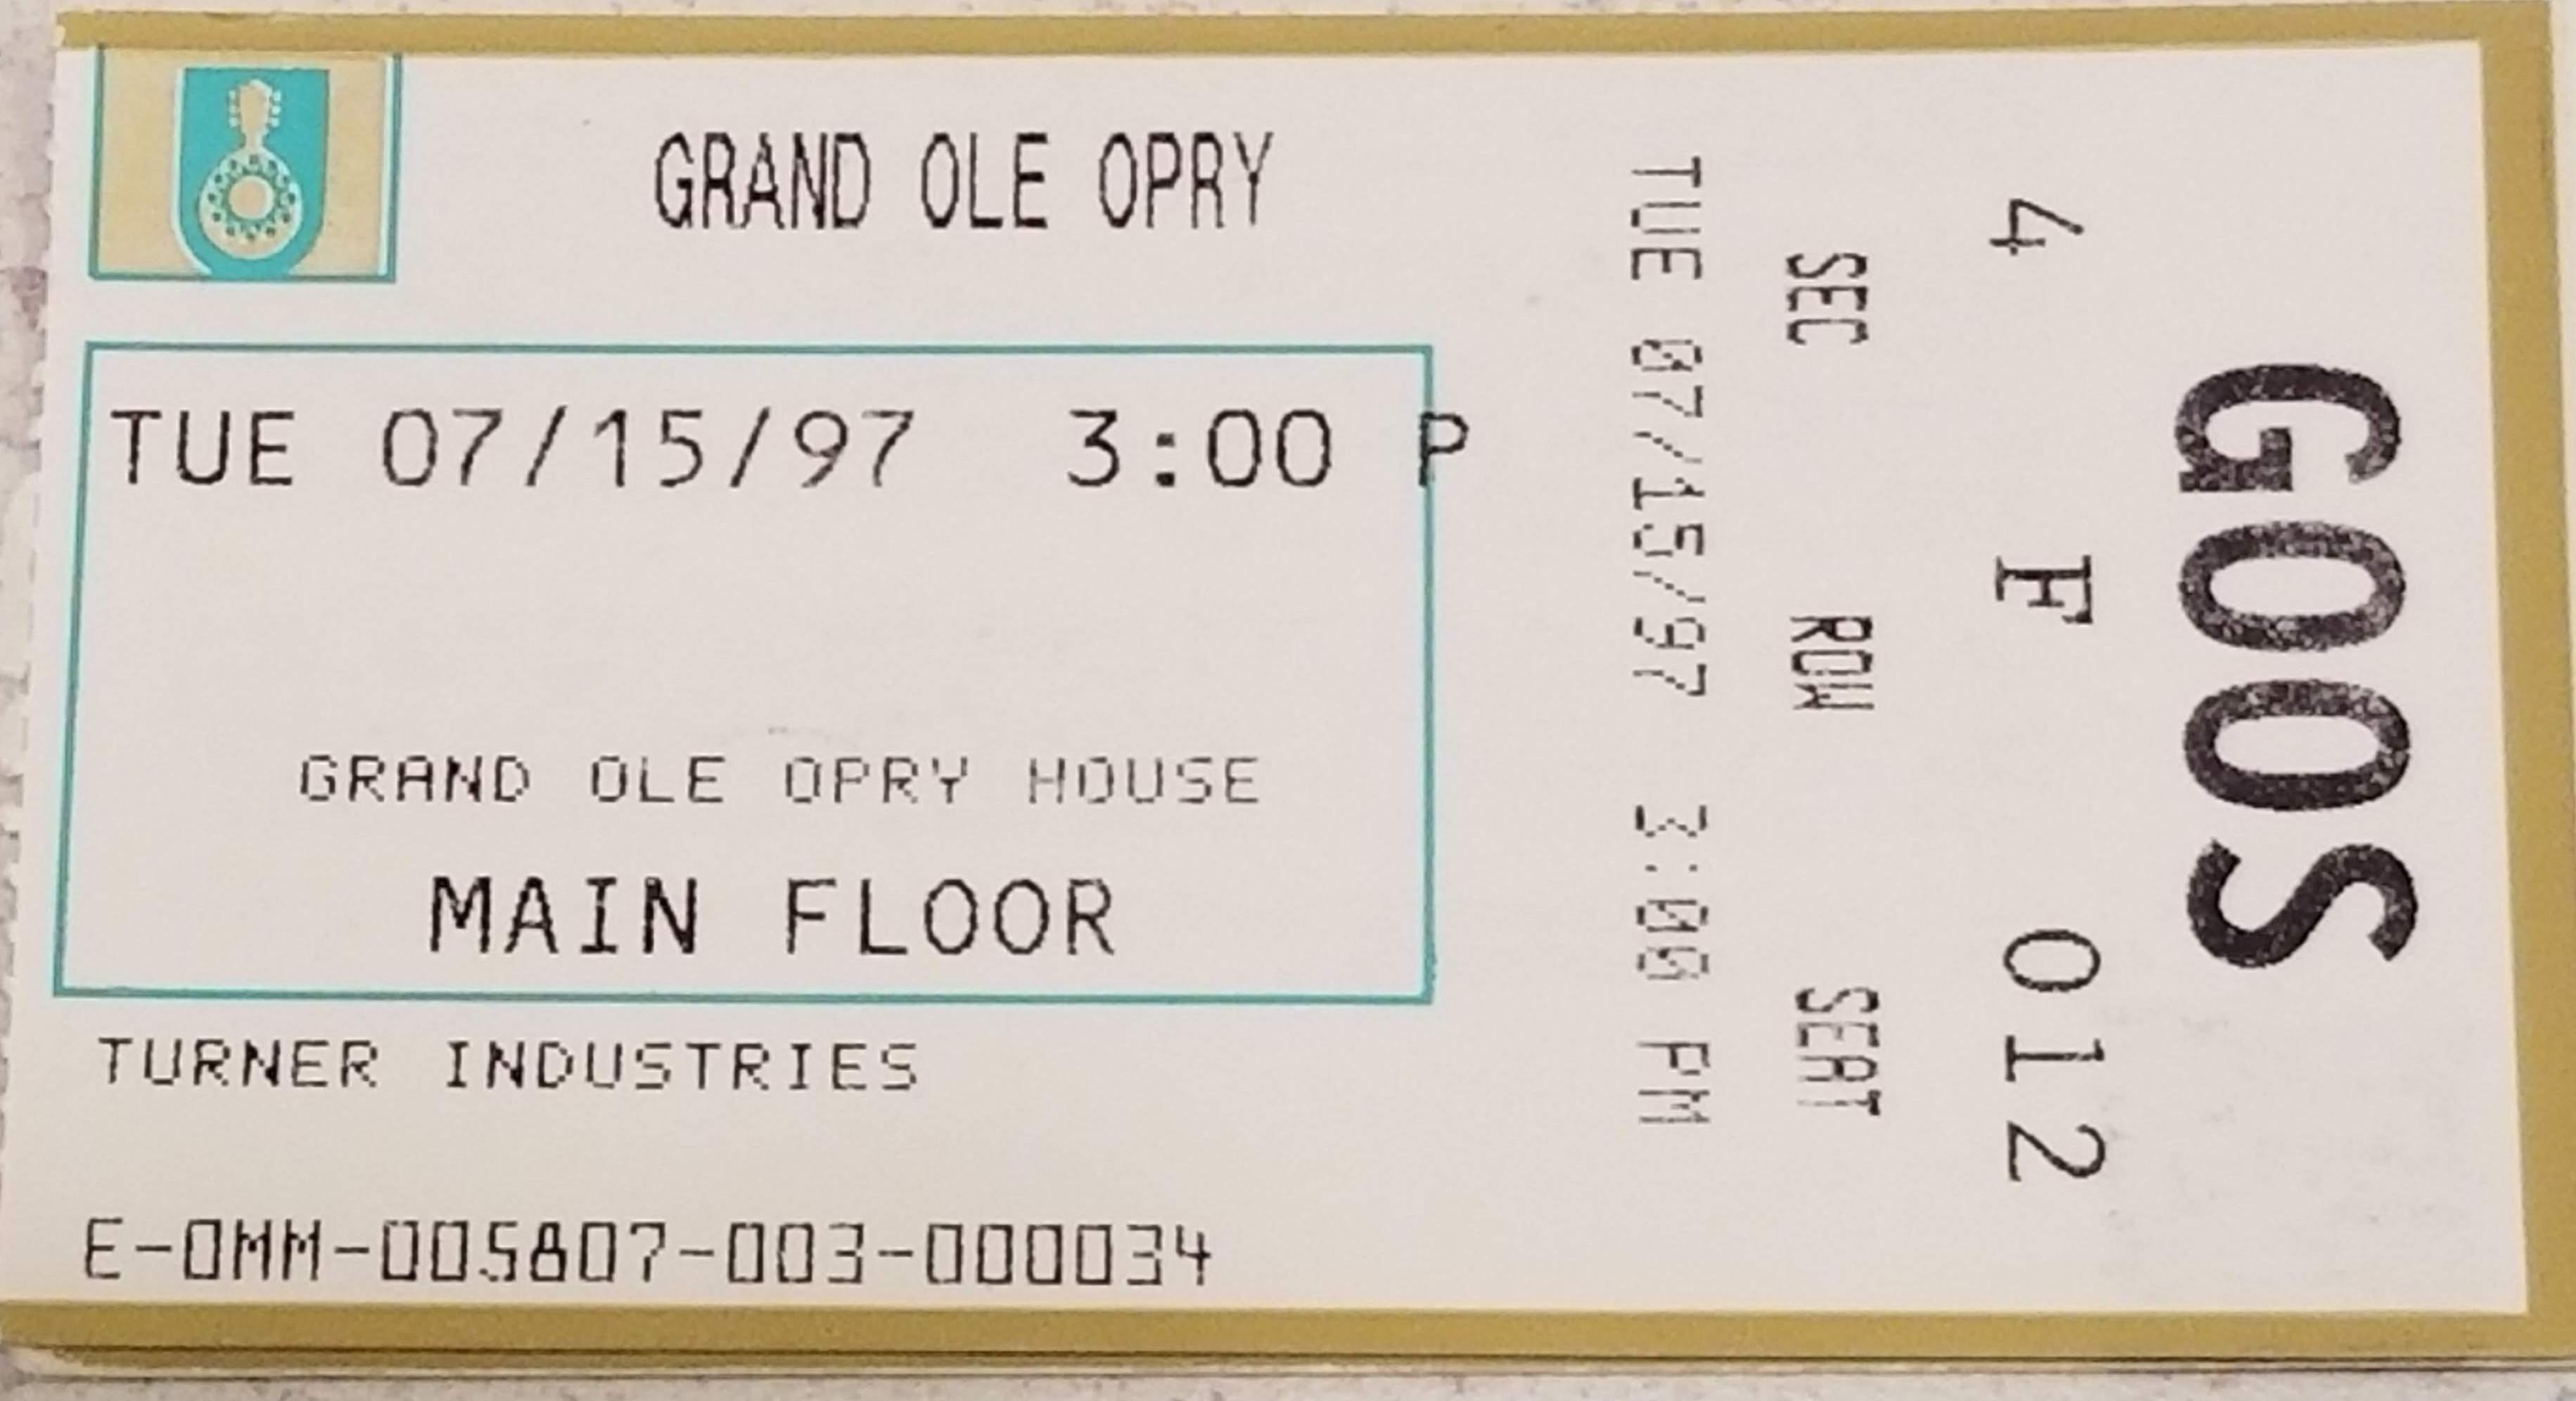 grandoleopry